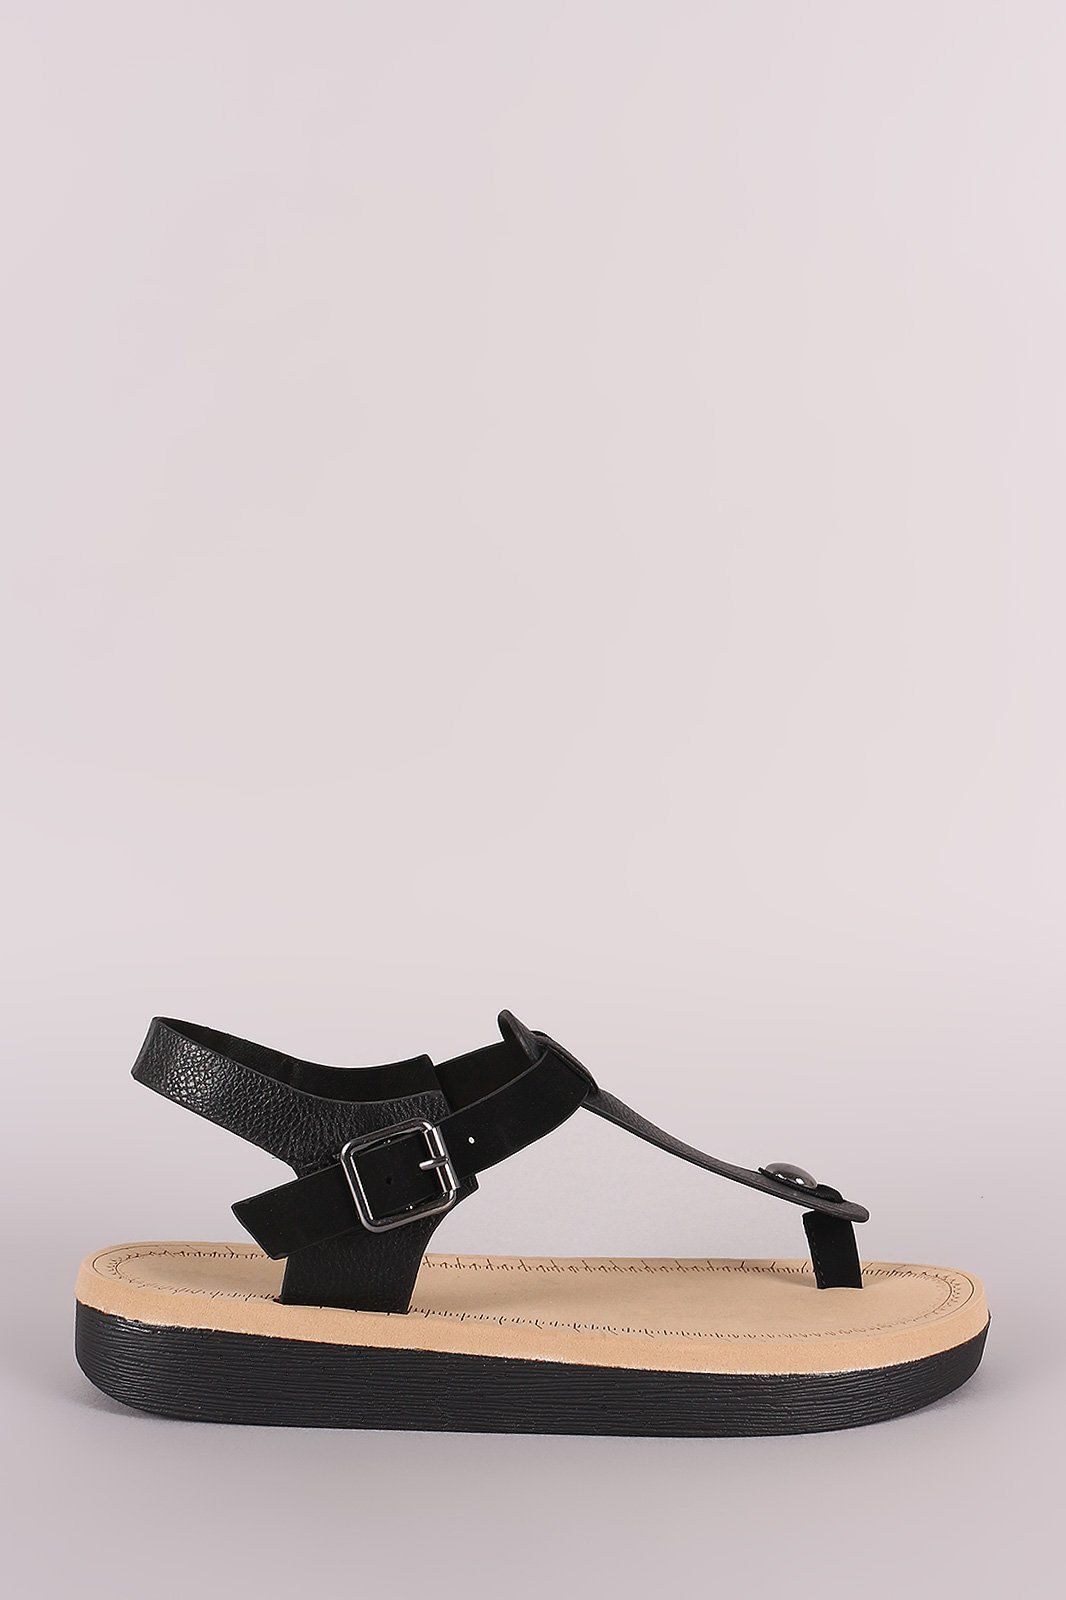 c69e3566115d Bamboo Vegan Leather Flatform Stud Thong Sandal